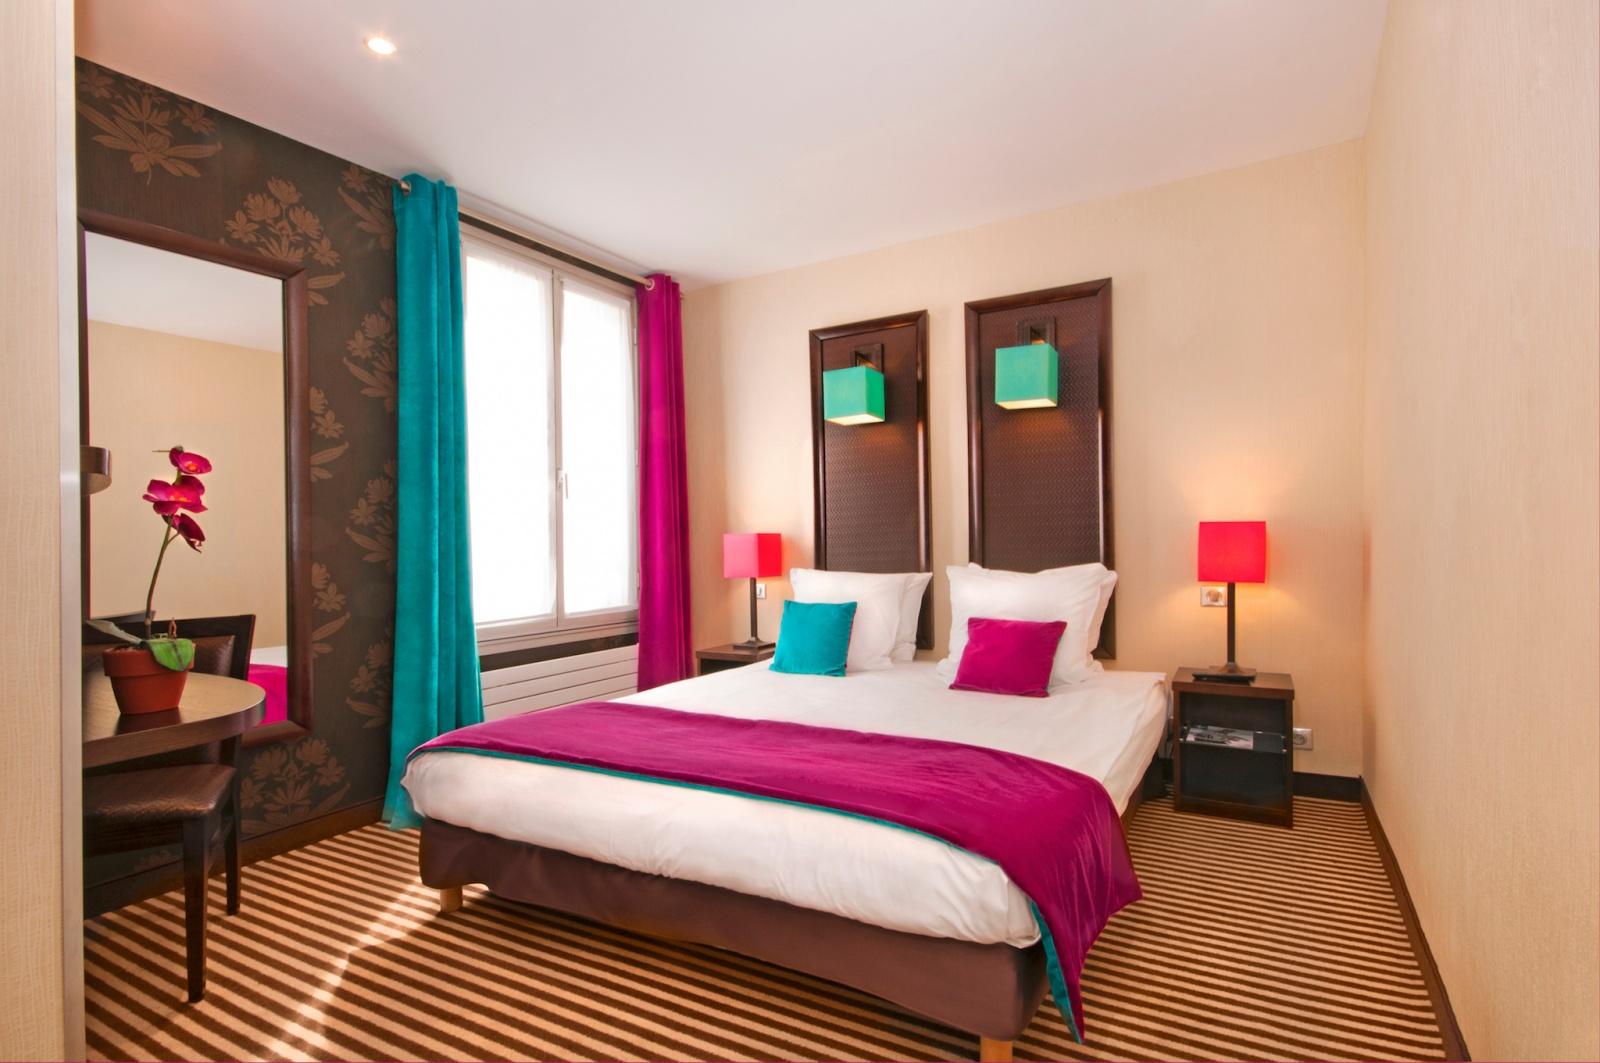 hotel pax op ra paris welcome official website. Black Bedroom Furniture Sets. Home Design Ideas